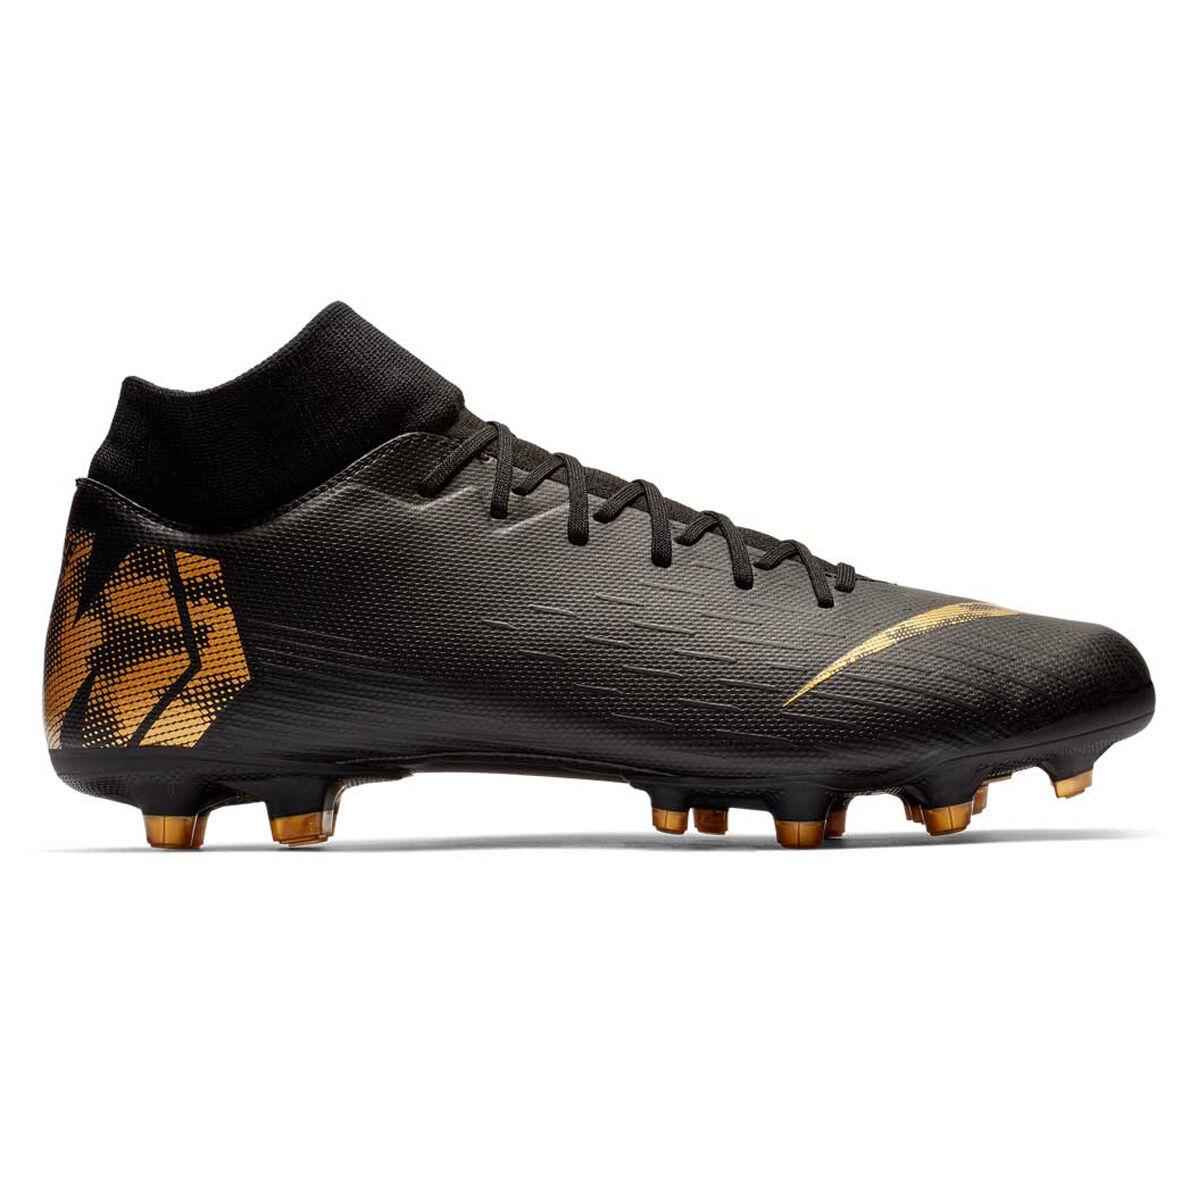 Buy online for genuine Men's Nike Mercurial football boots